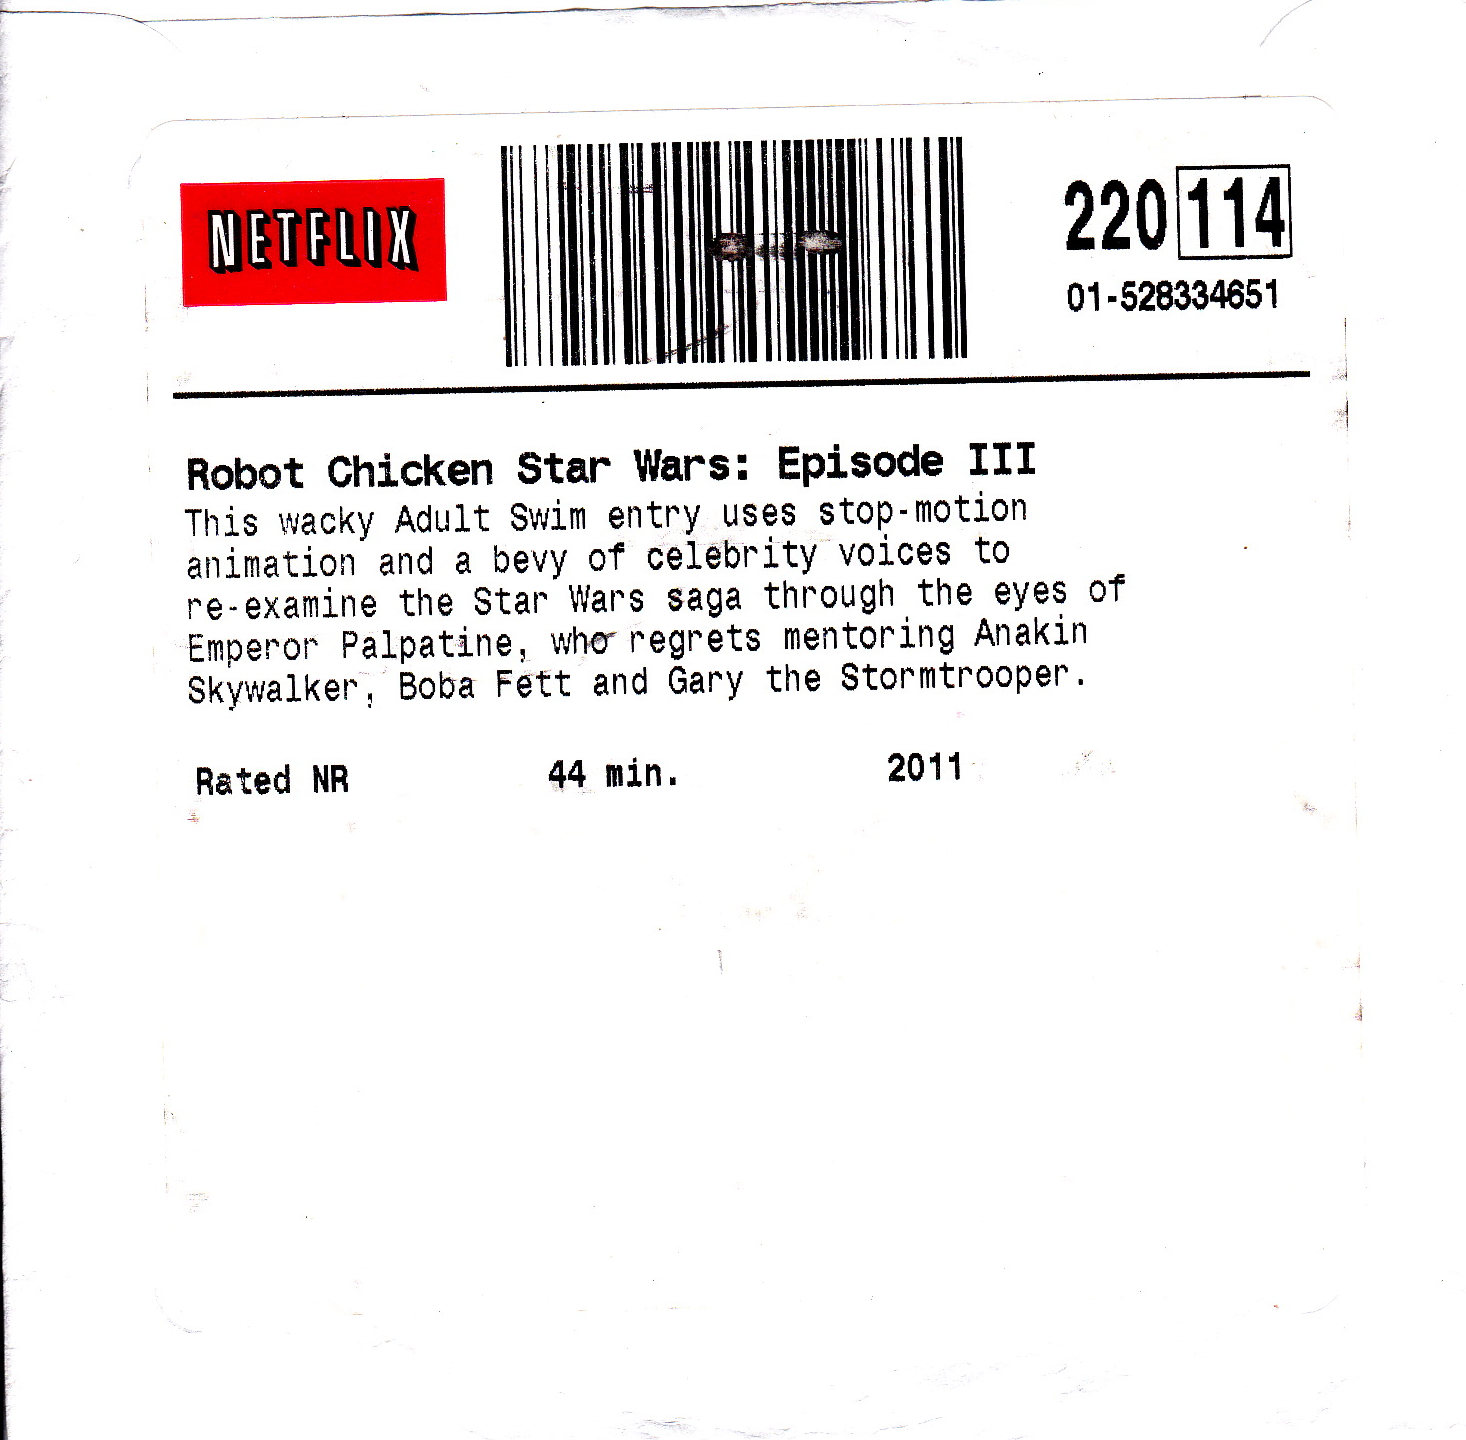 Star Wars Love Quotes My Life Scanned Robot Chicken Star Wars Episode Iii Dvd Robot